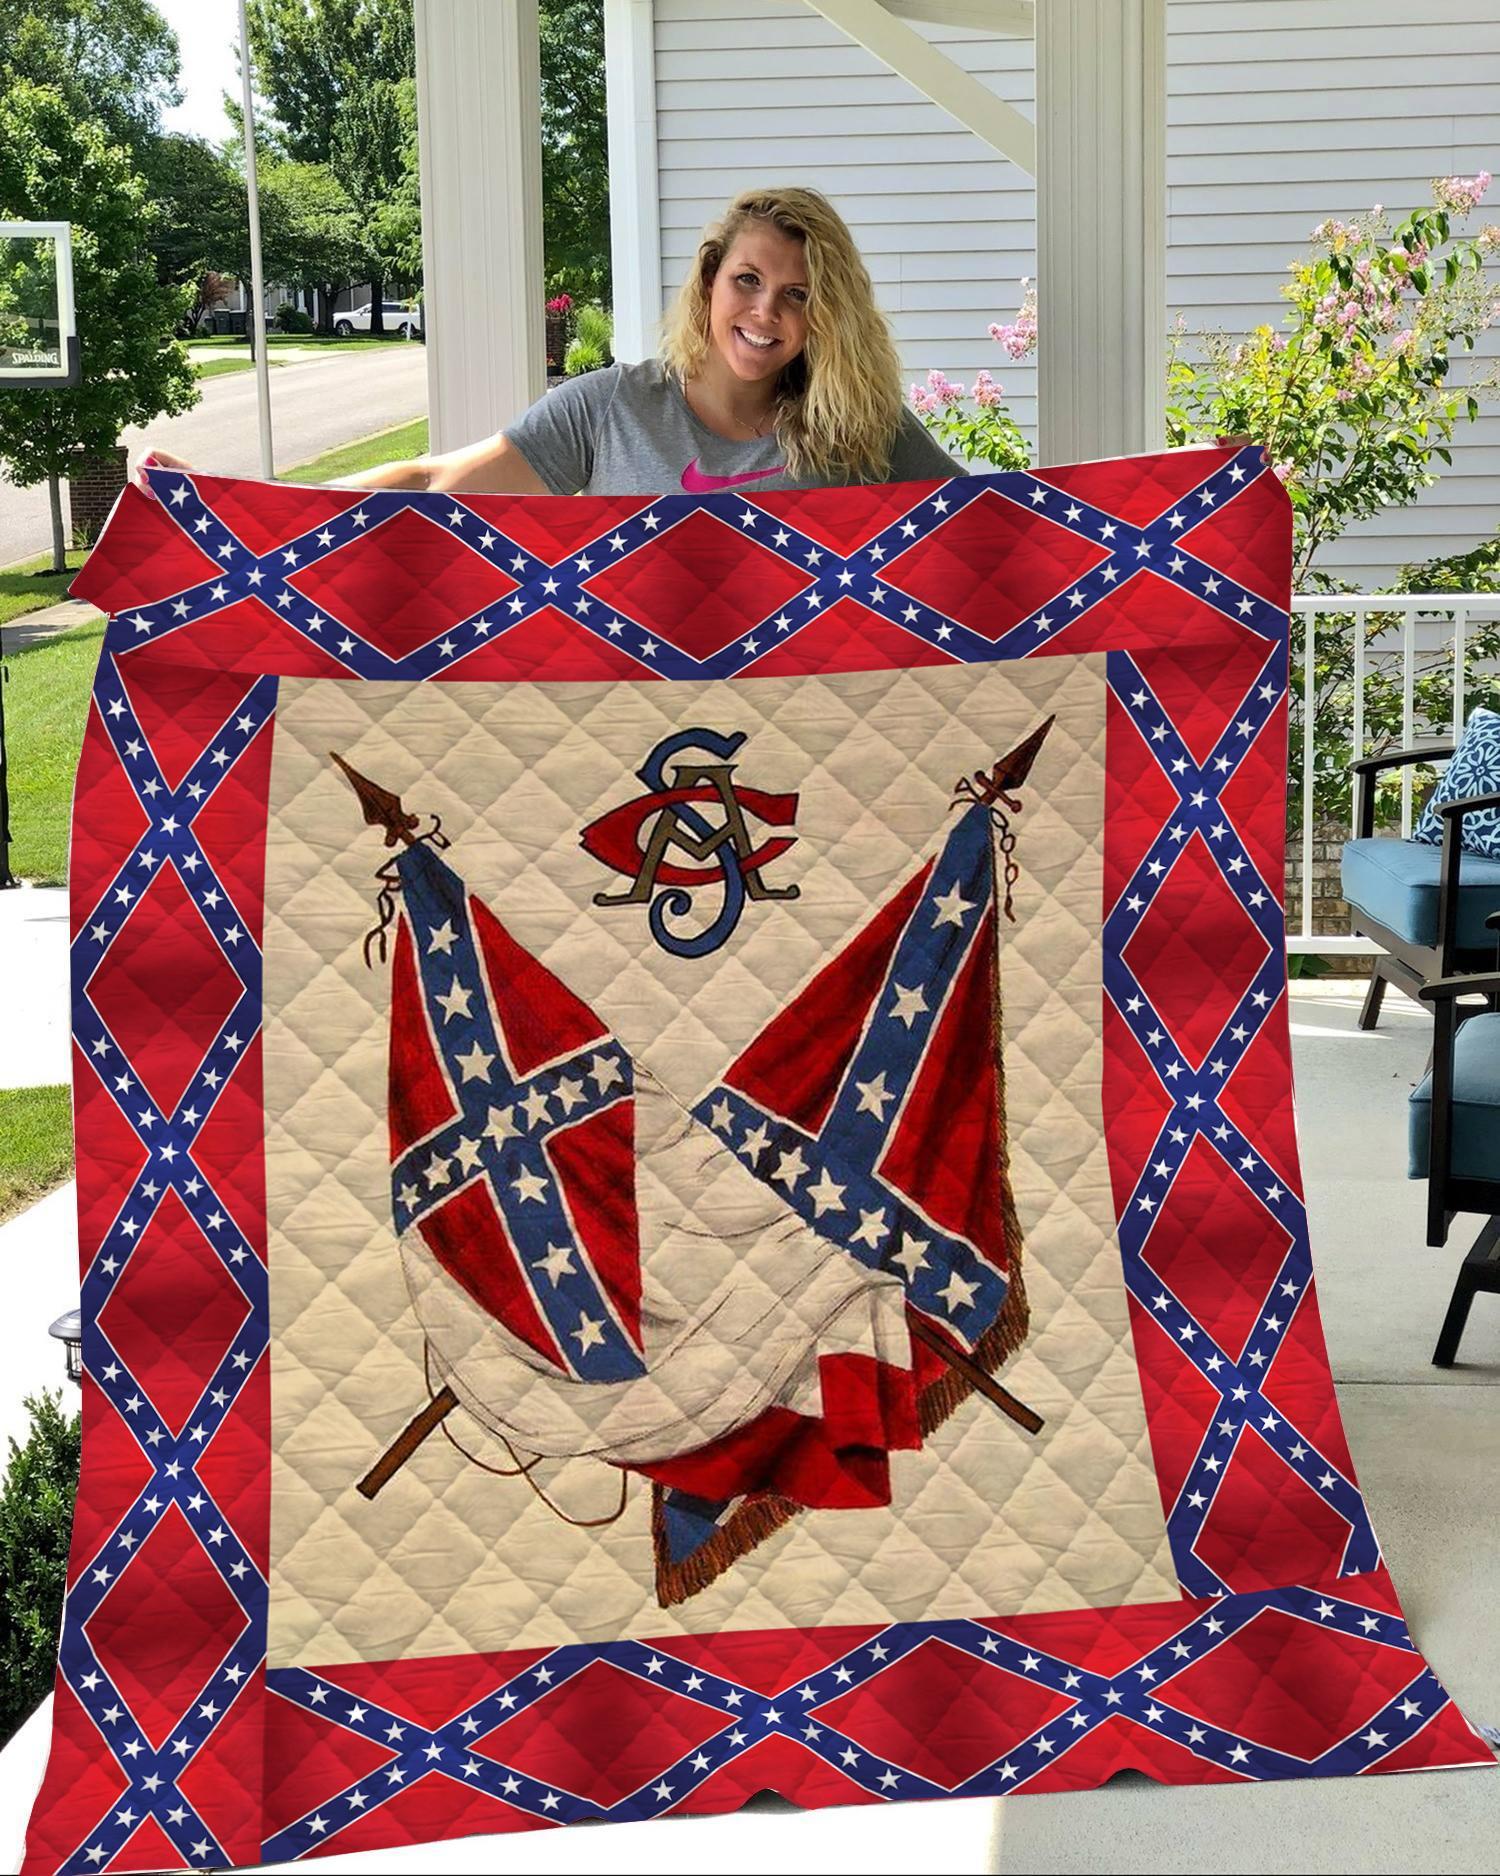 Redneck confederate flag 3d blanket 2- maria